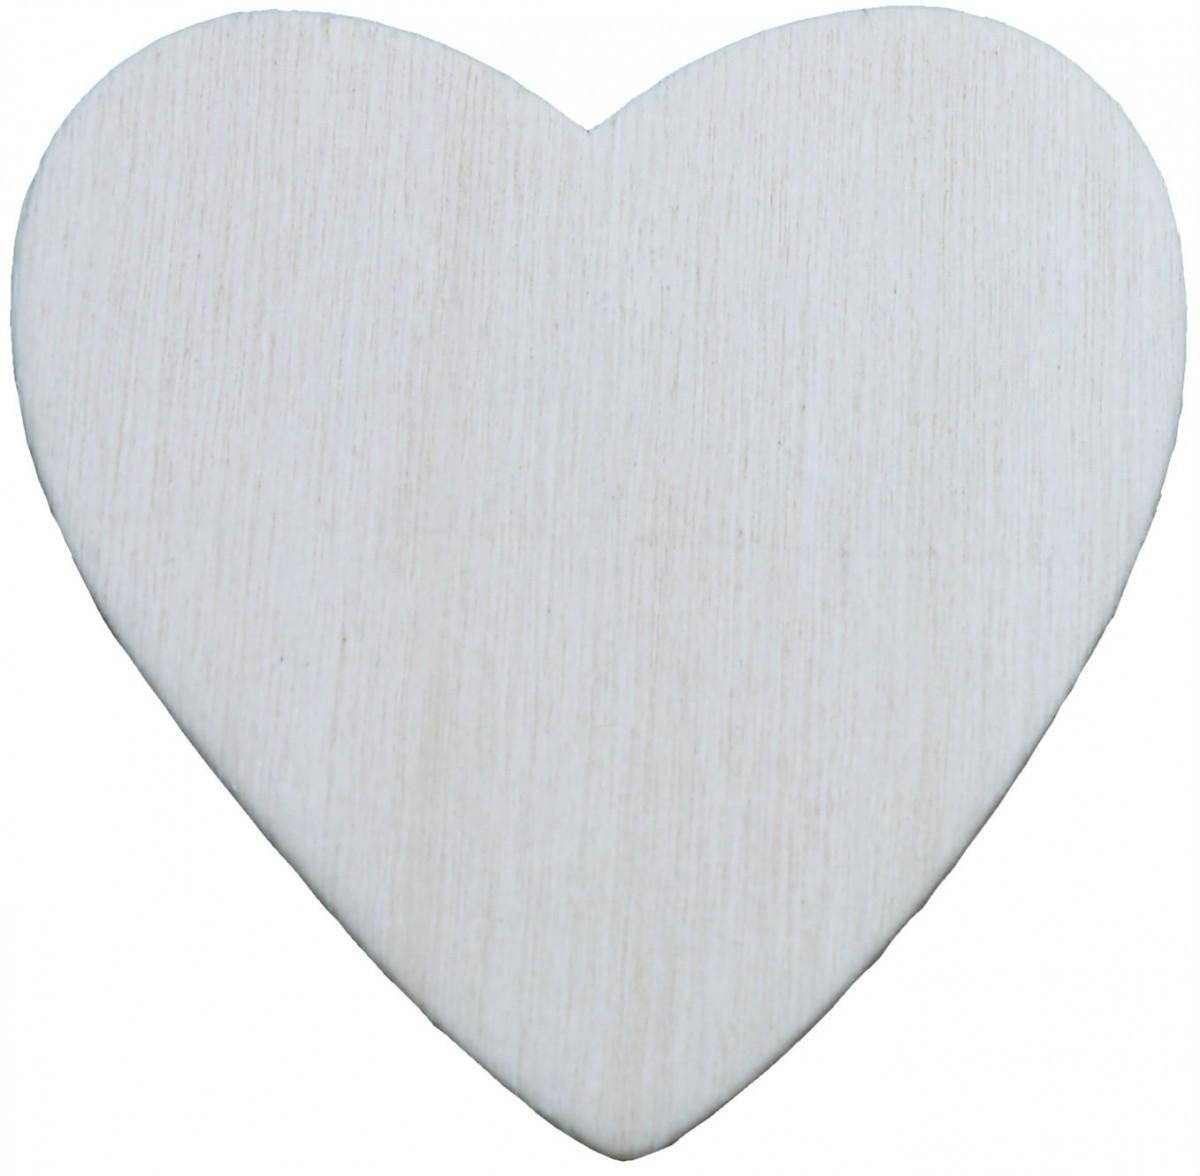 Holzherzen natur 30 Stück 3cm - zum Basteln, Bemalen, Streu-Deko, Tischdeko